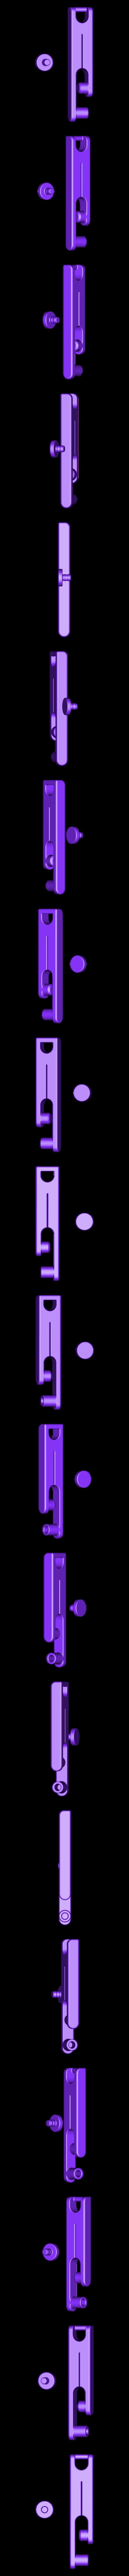 Carabiner_09-1.stl Download free STL file Strong Flex door Carabiner • 3D printer template, Pwenyrr